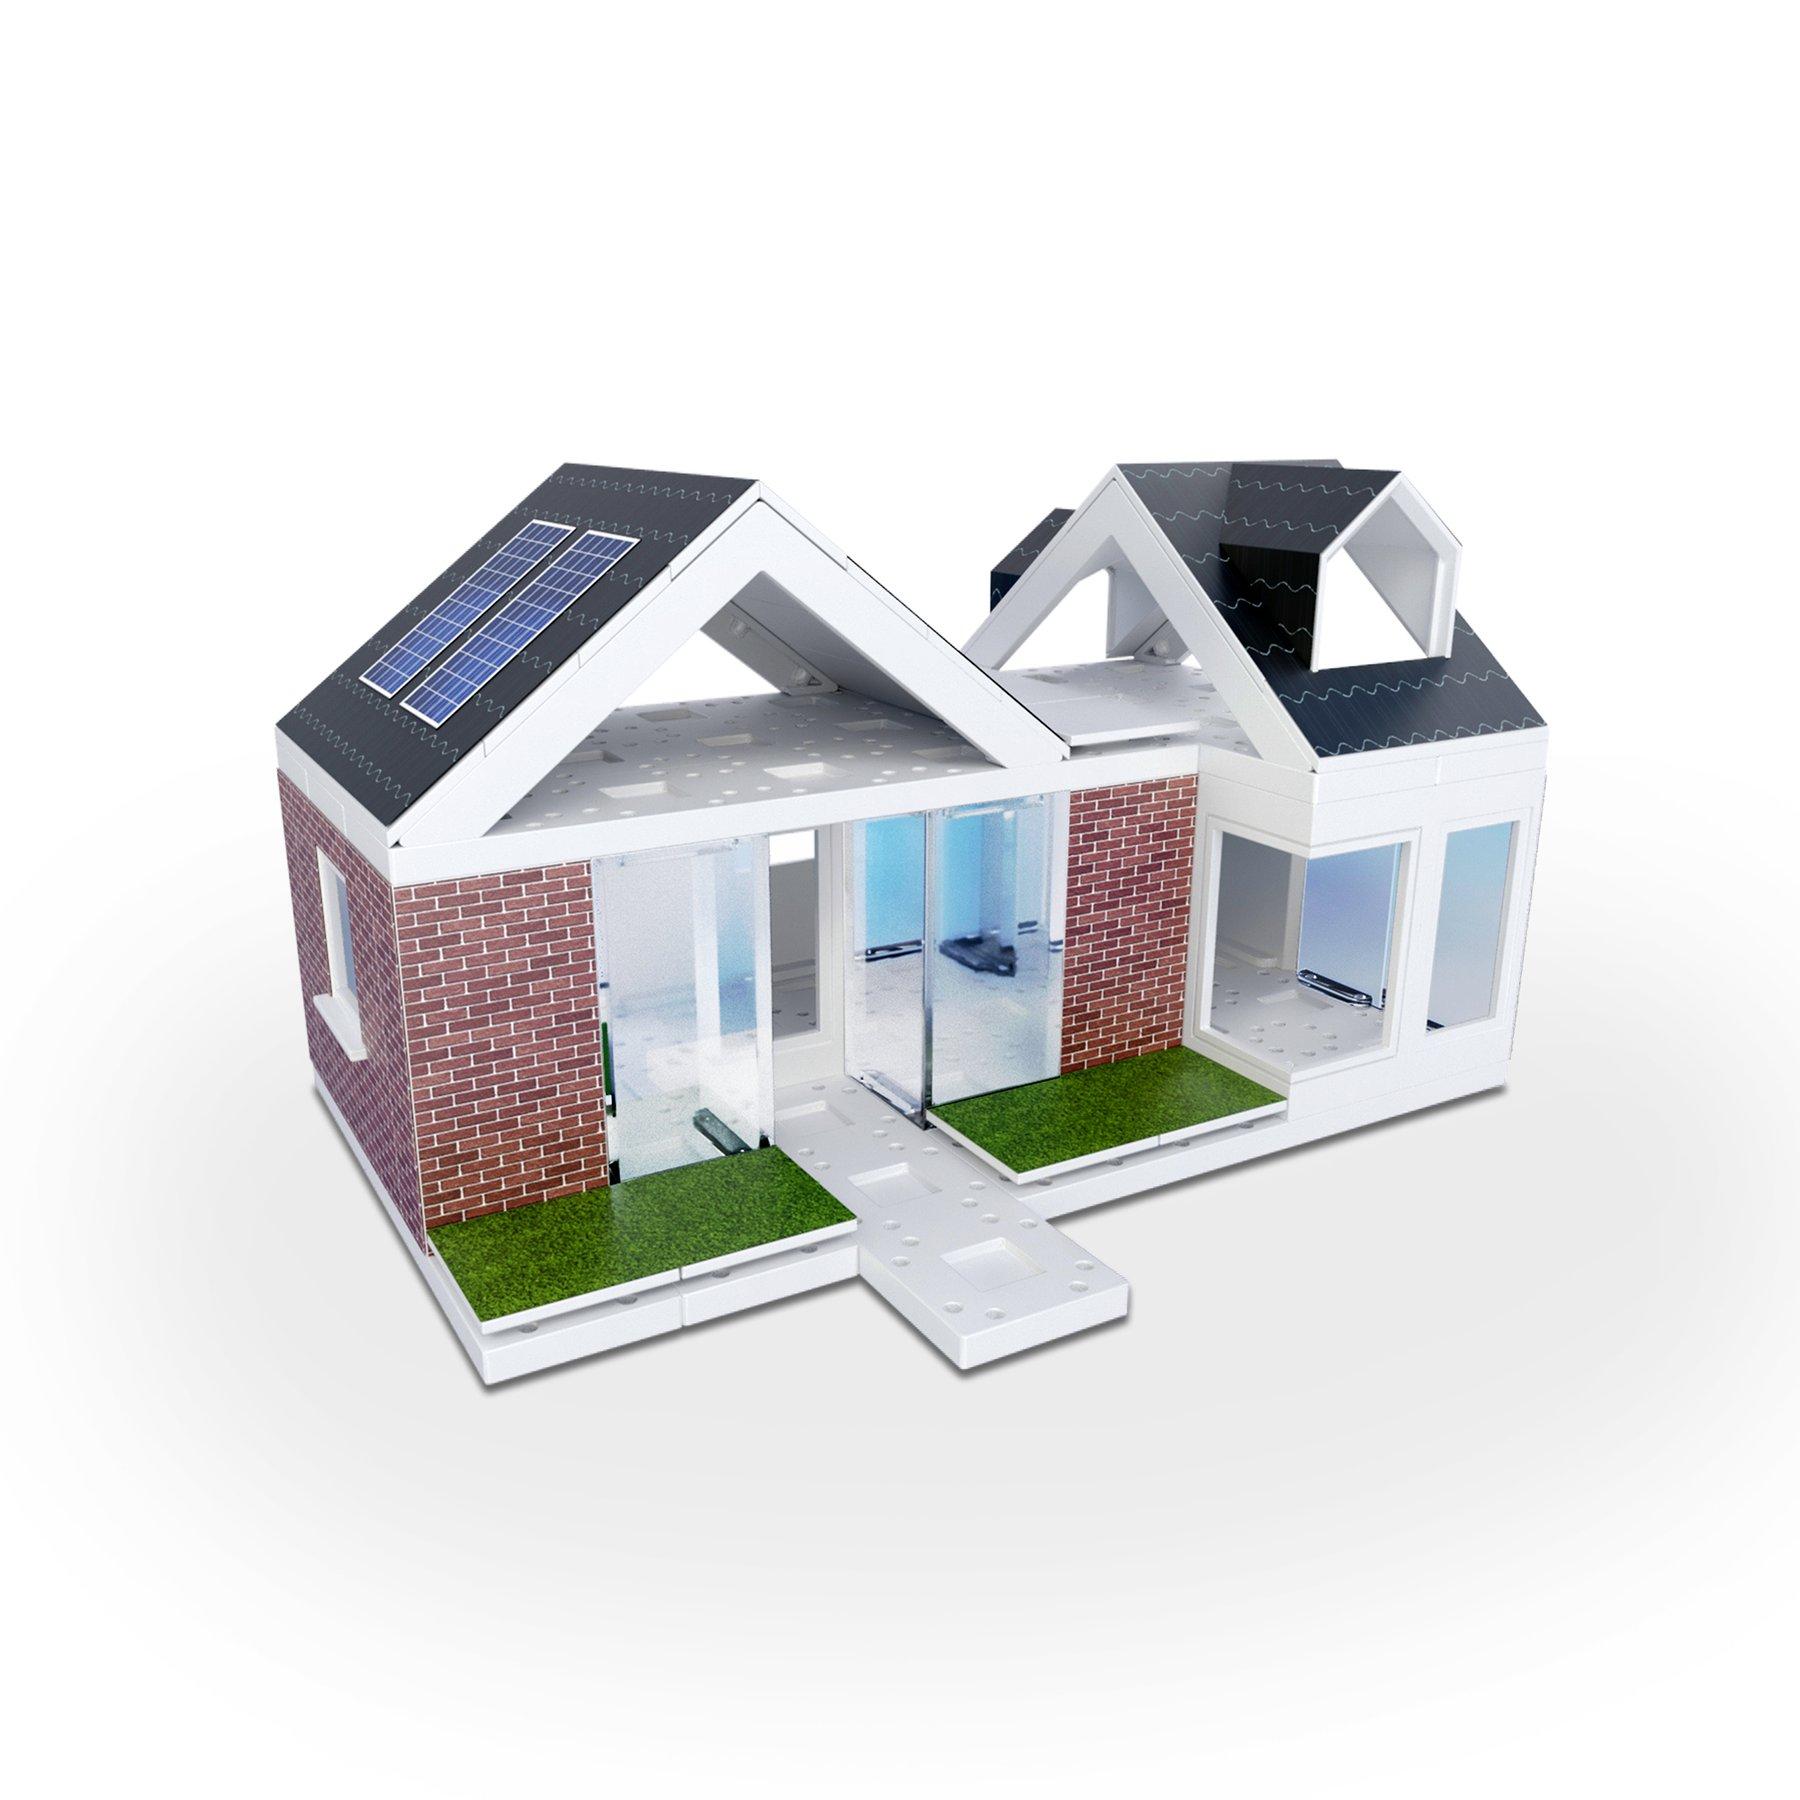 Arckit A10044 Mini Dormer 2.0 - Kids Architectural Model Building Kit - 80 Piece